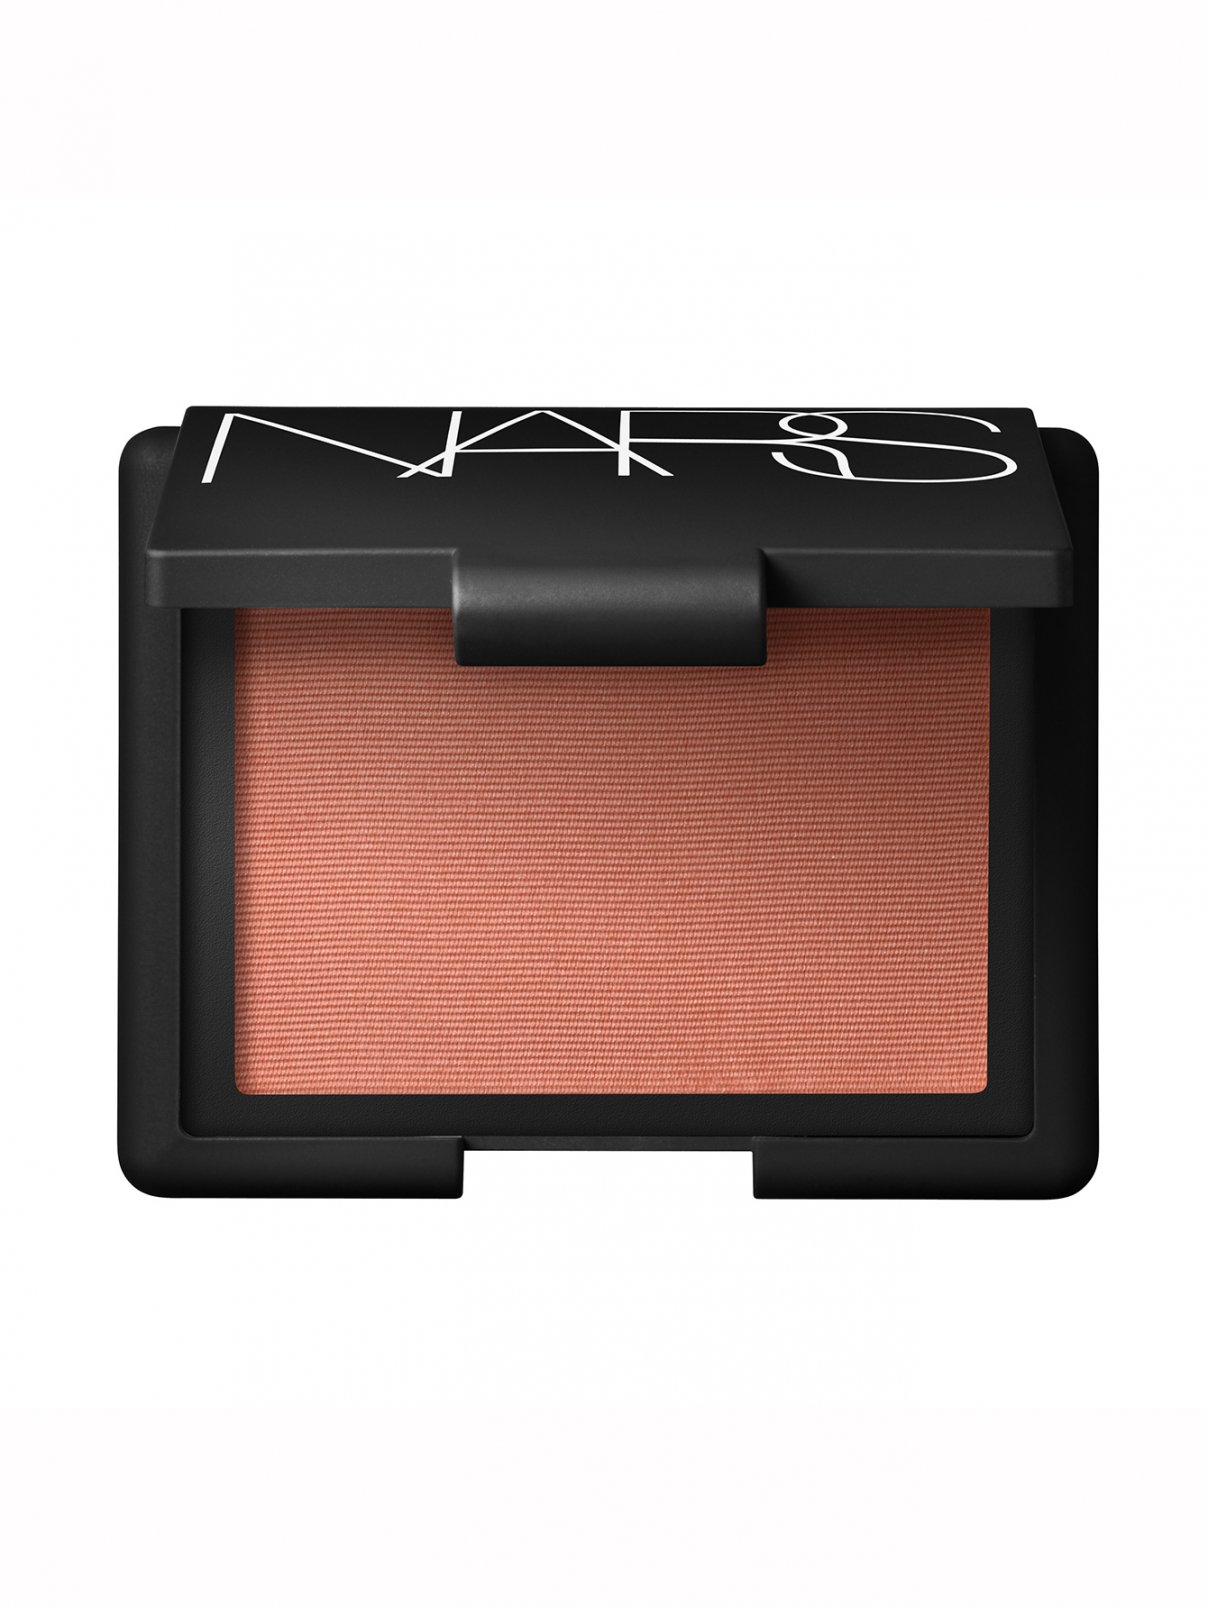 Румяна GINA Makeup NARS  –  Общий вид